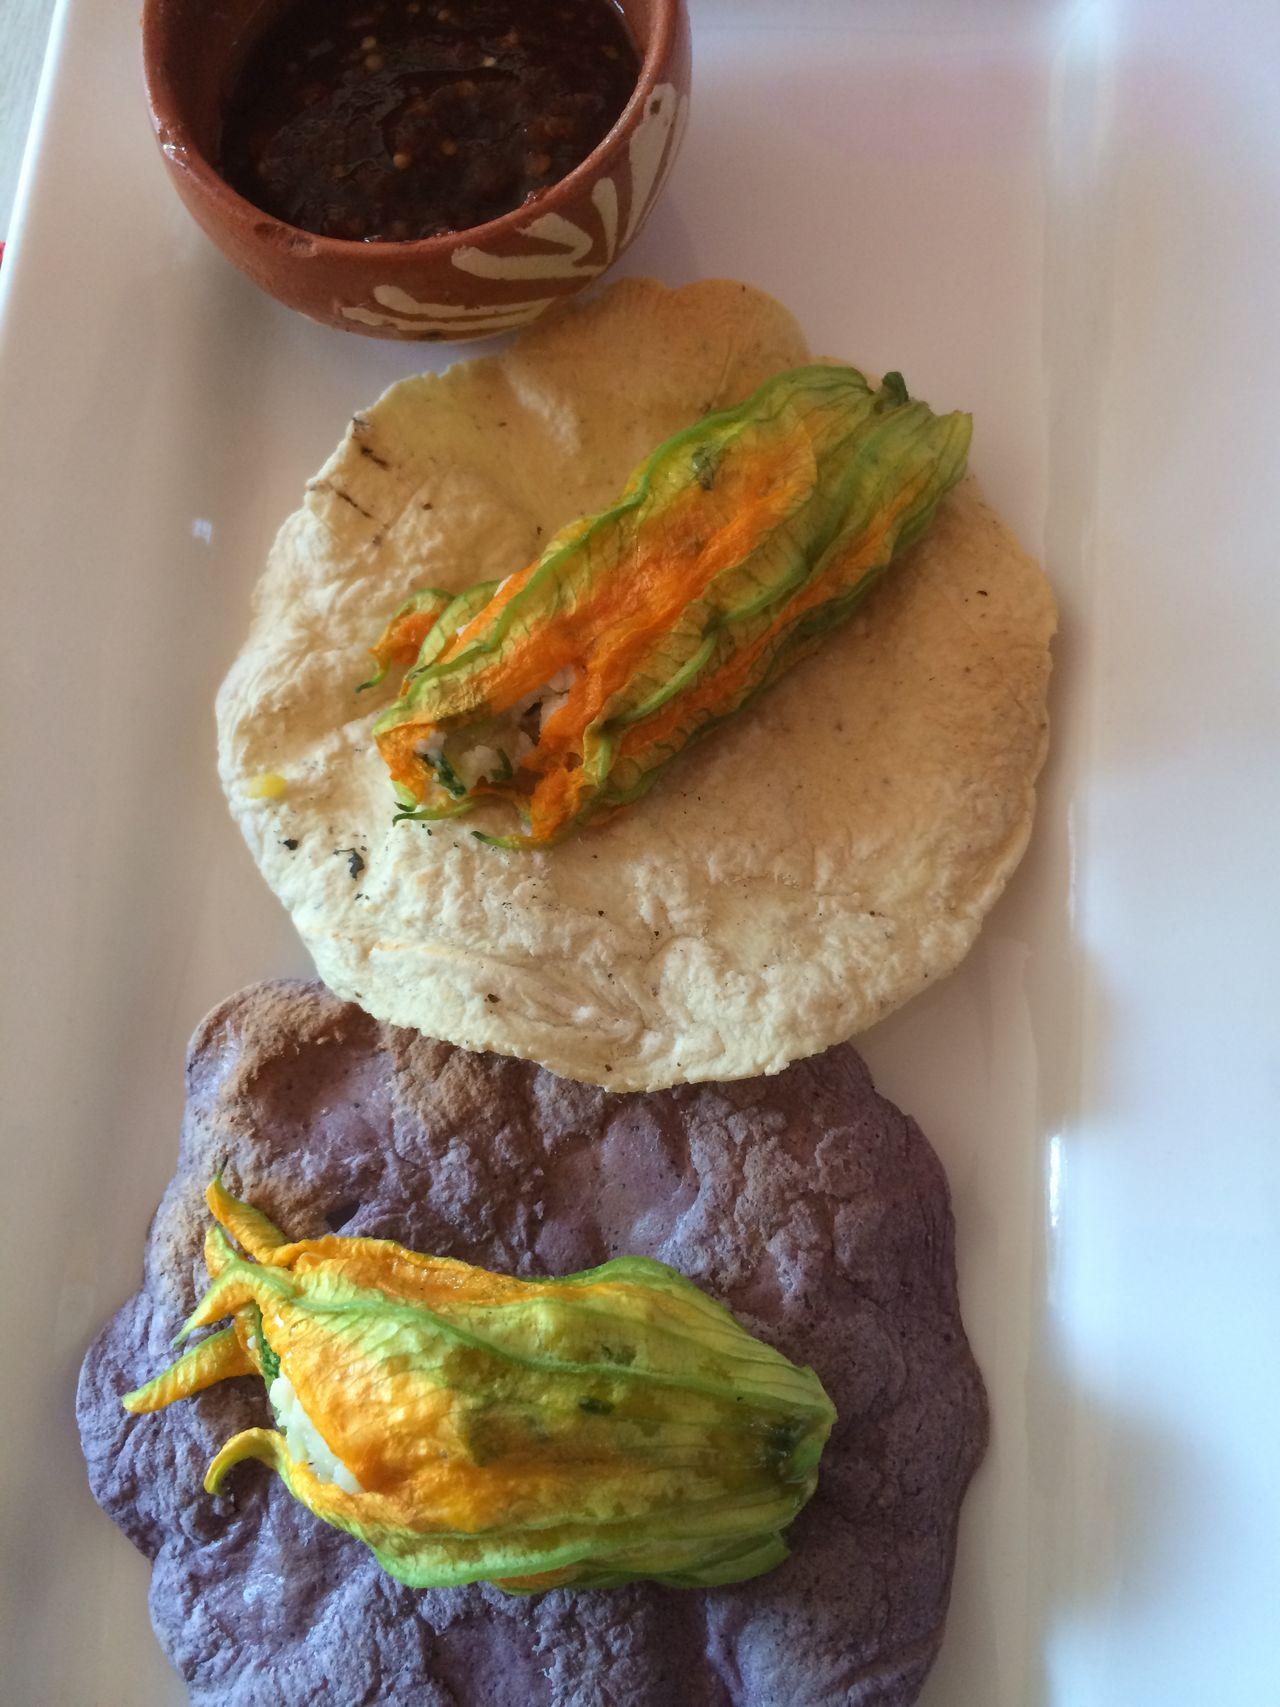 RePicture Travel Flor de Calabaza tacos